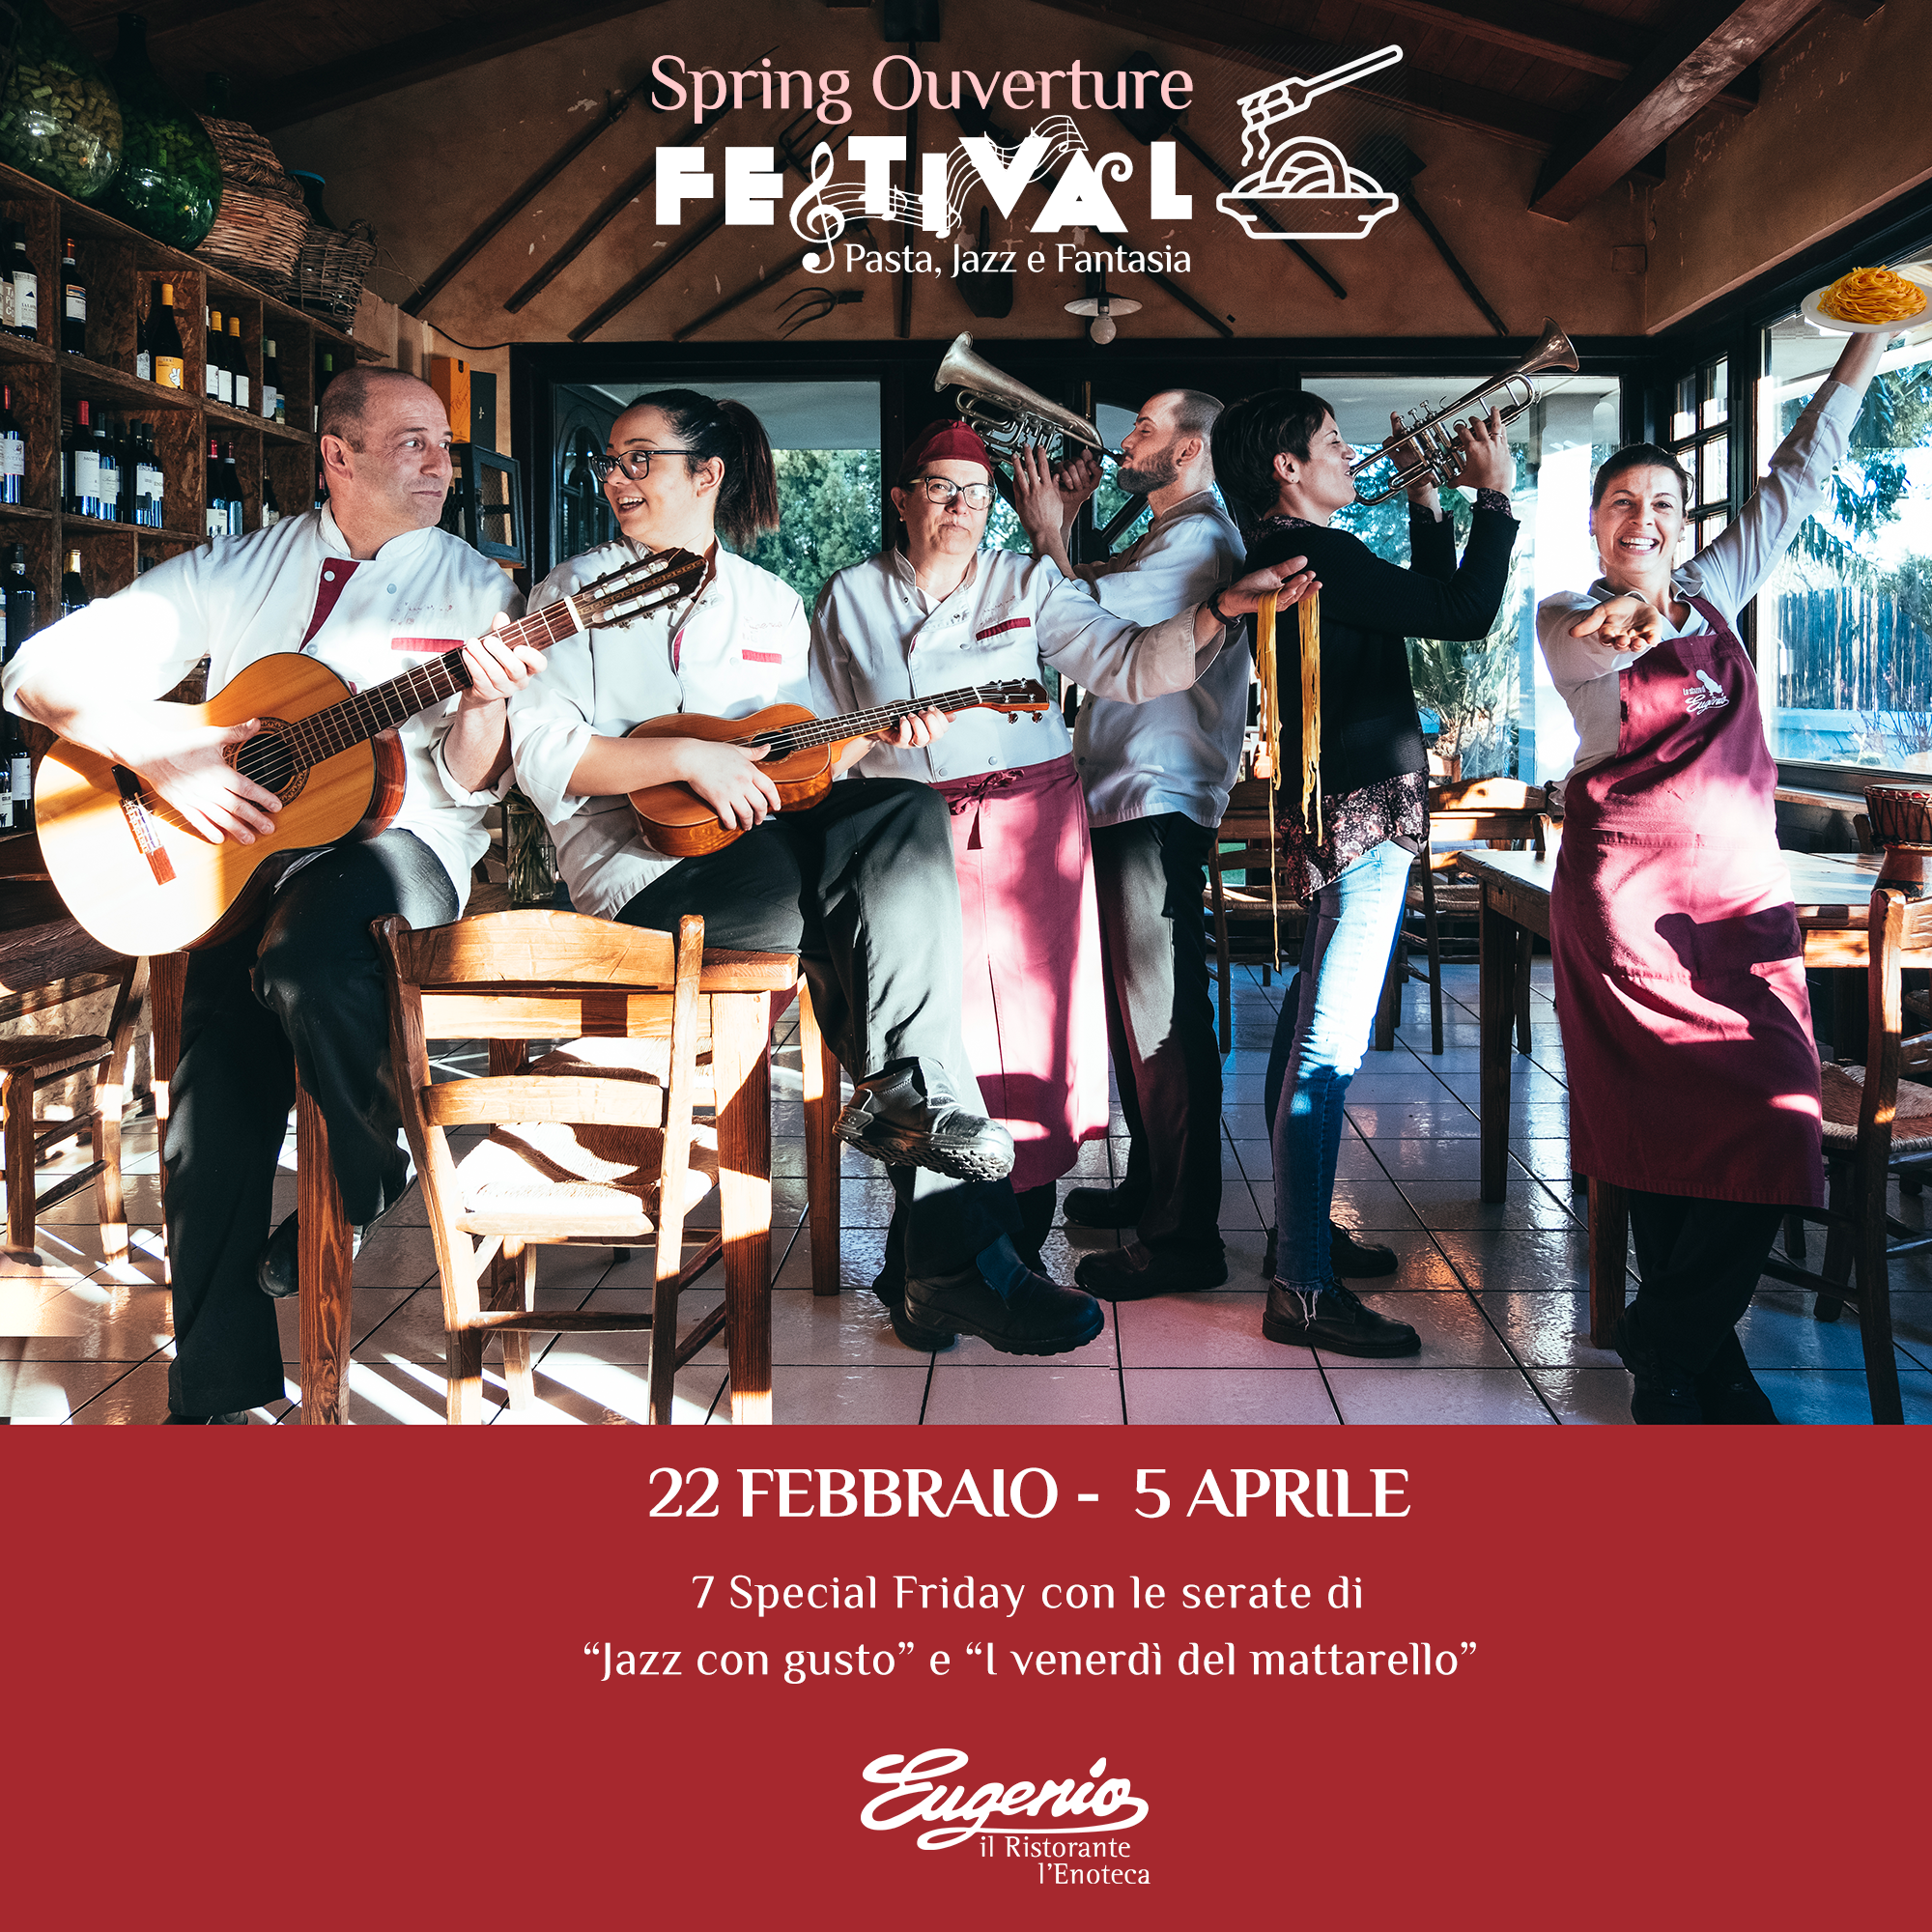 Spring Ouverture Festival Pasta, Jazz a Fantasia